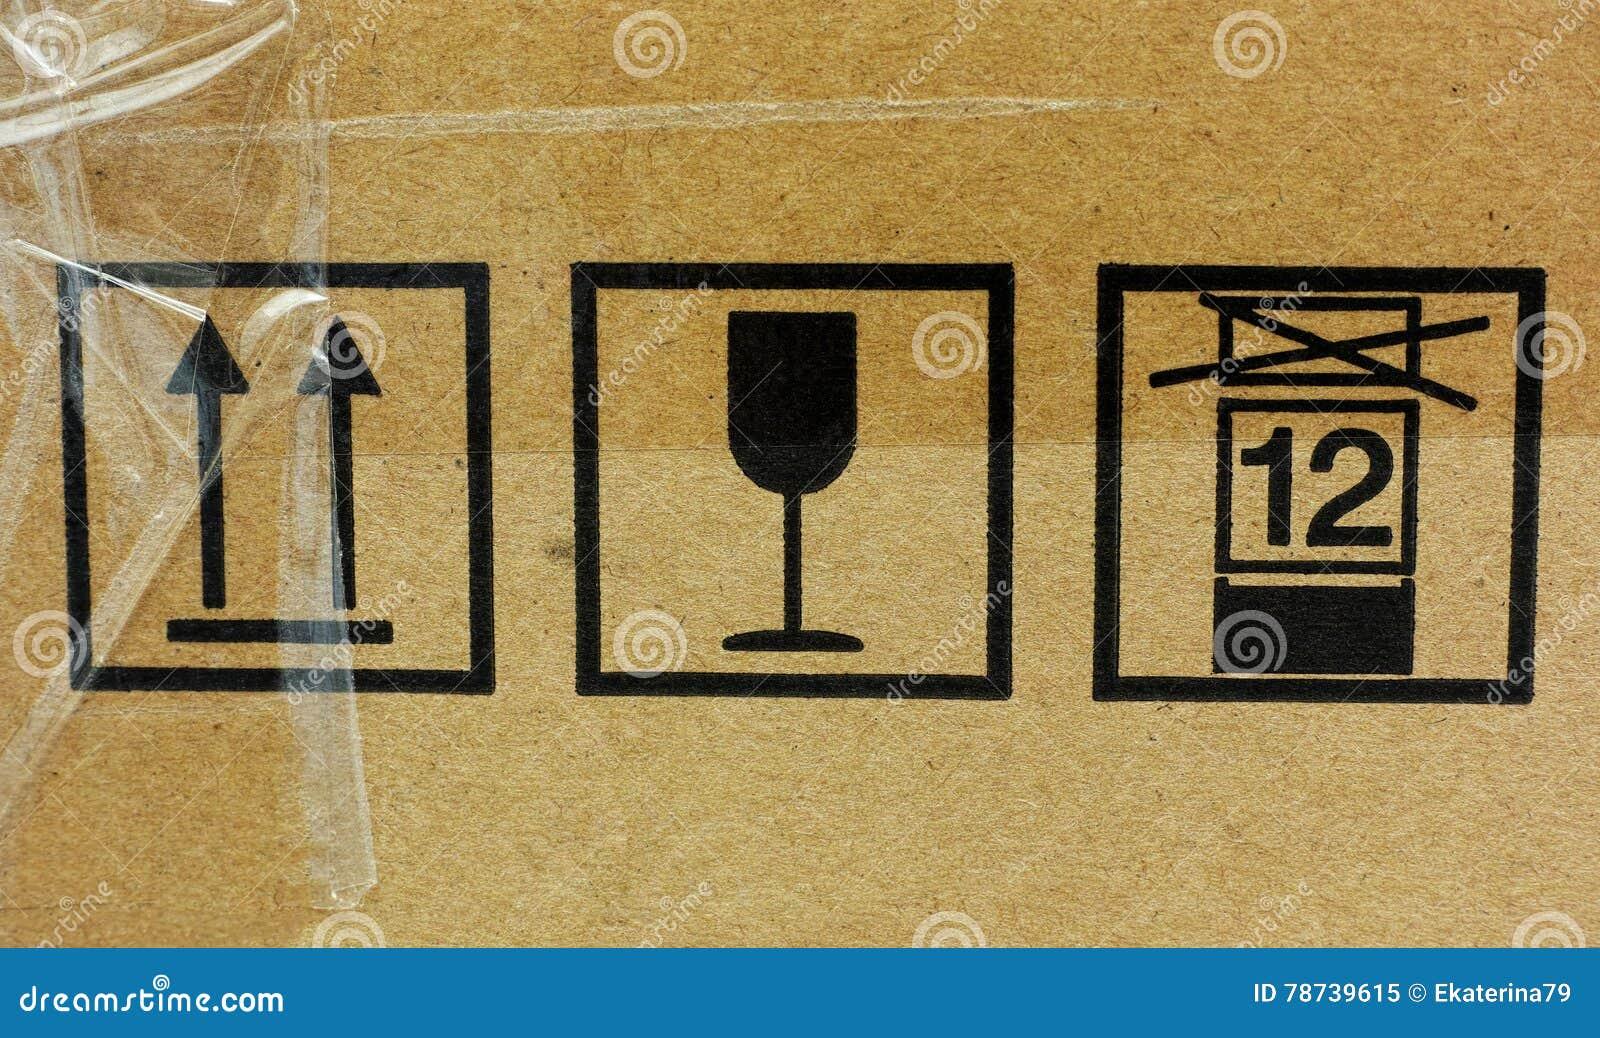 Three fragile symbol on cardboard